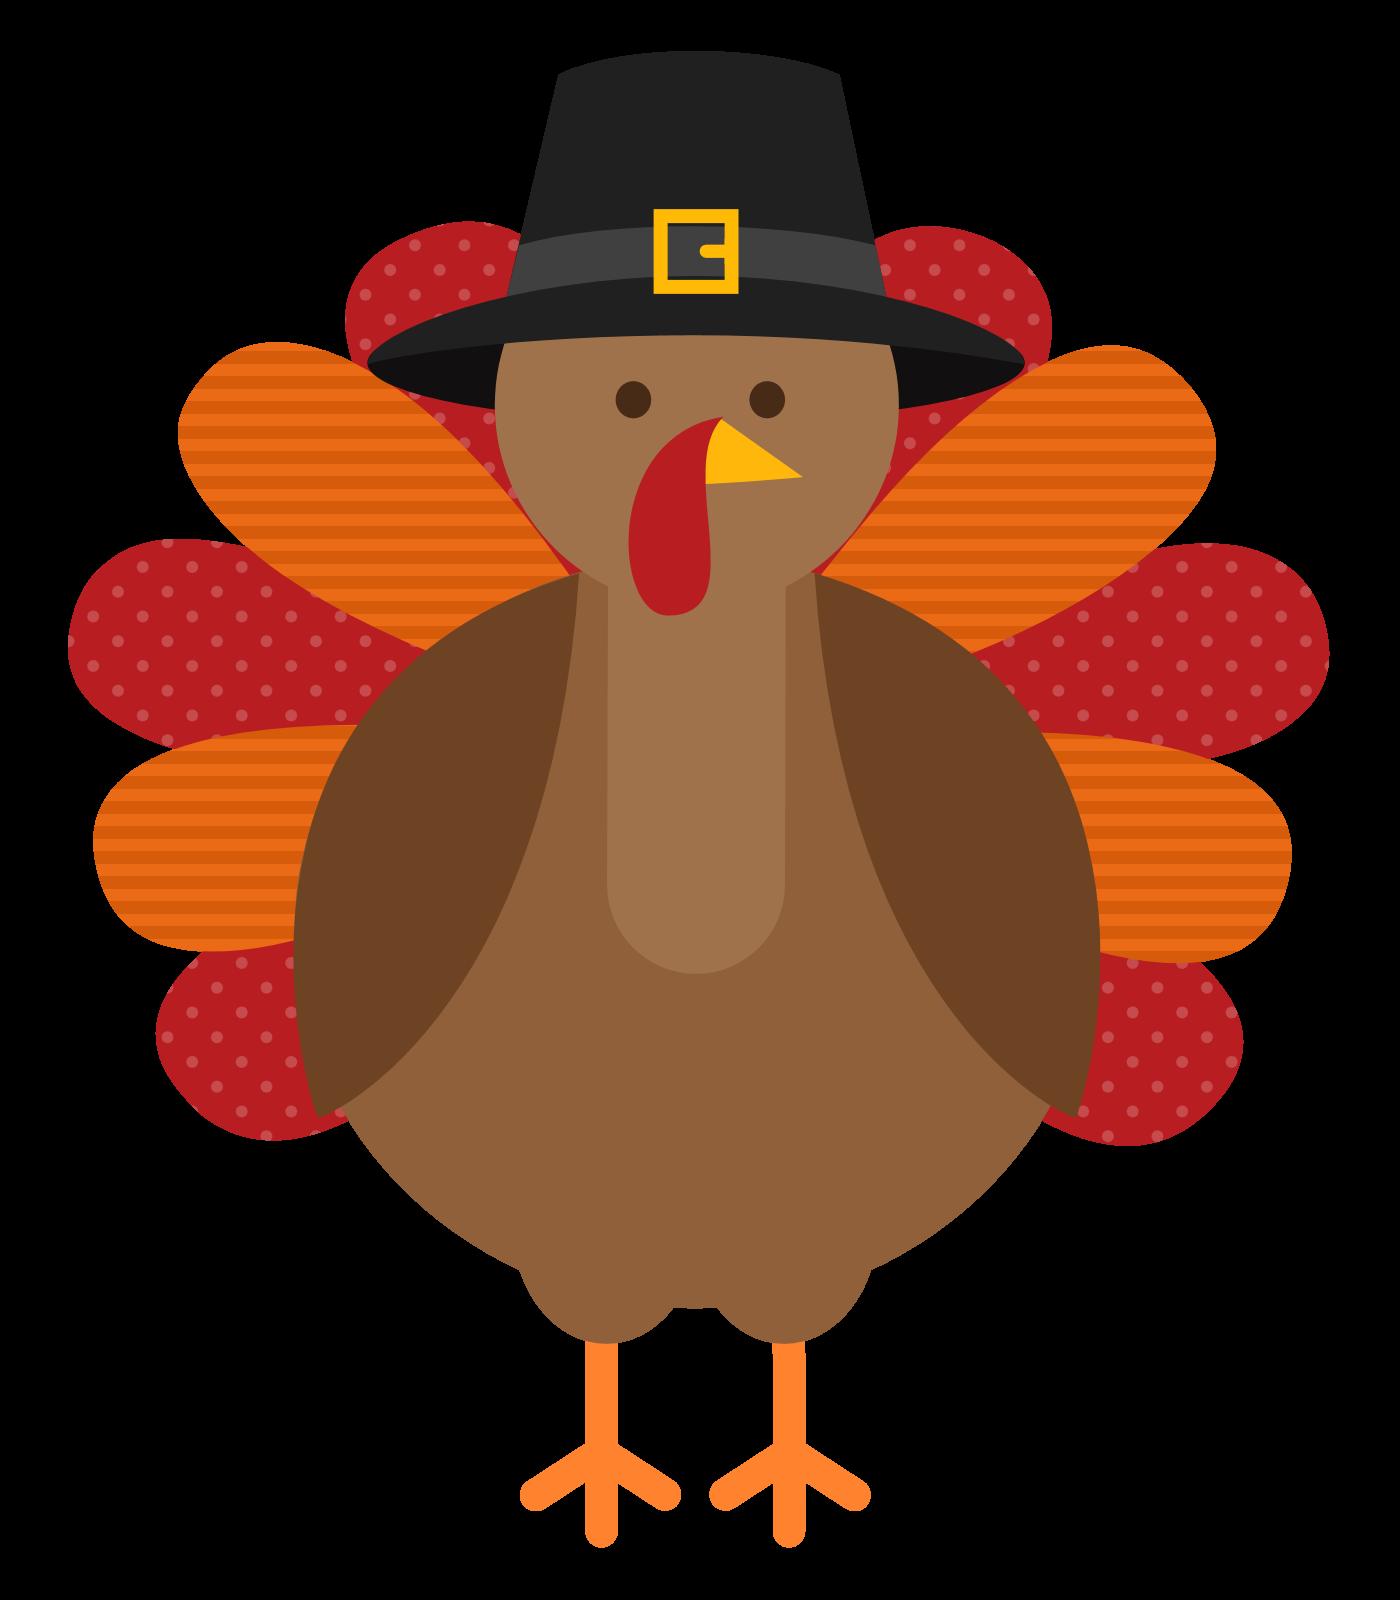 download turkey hd hq png image freepngimg